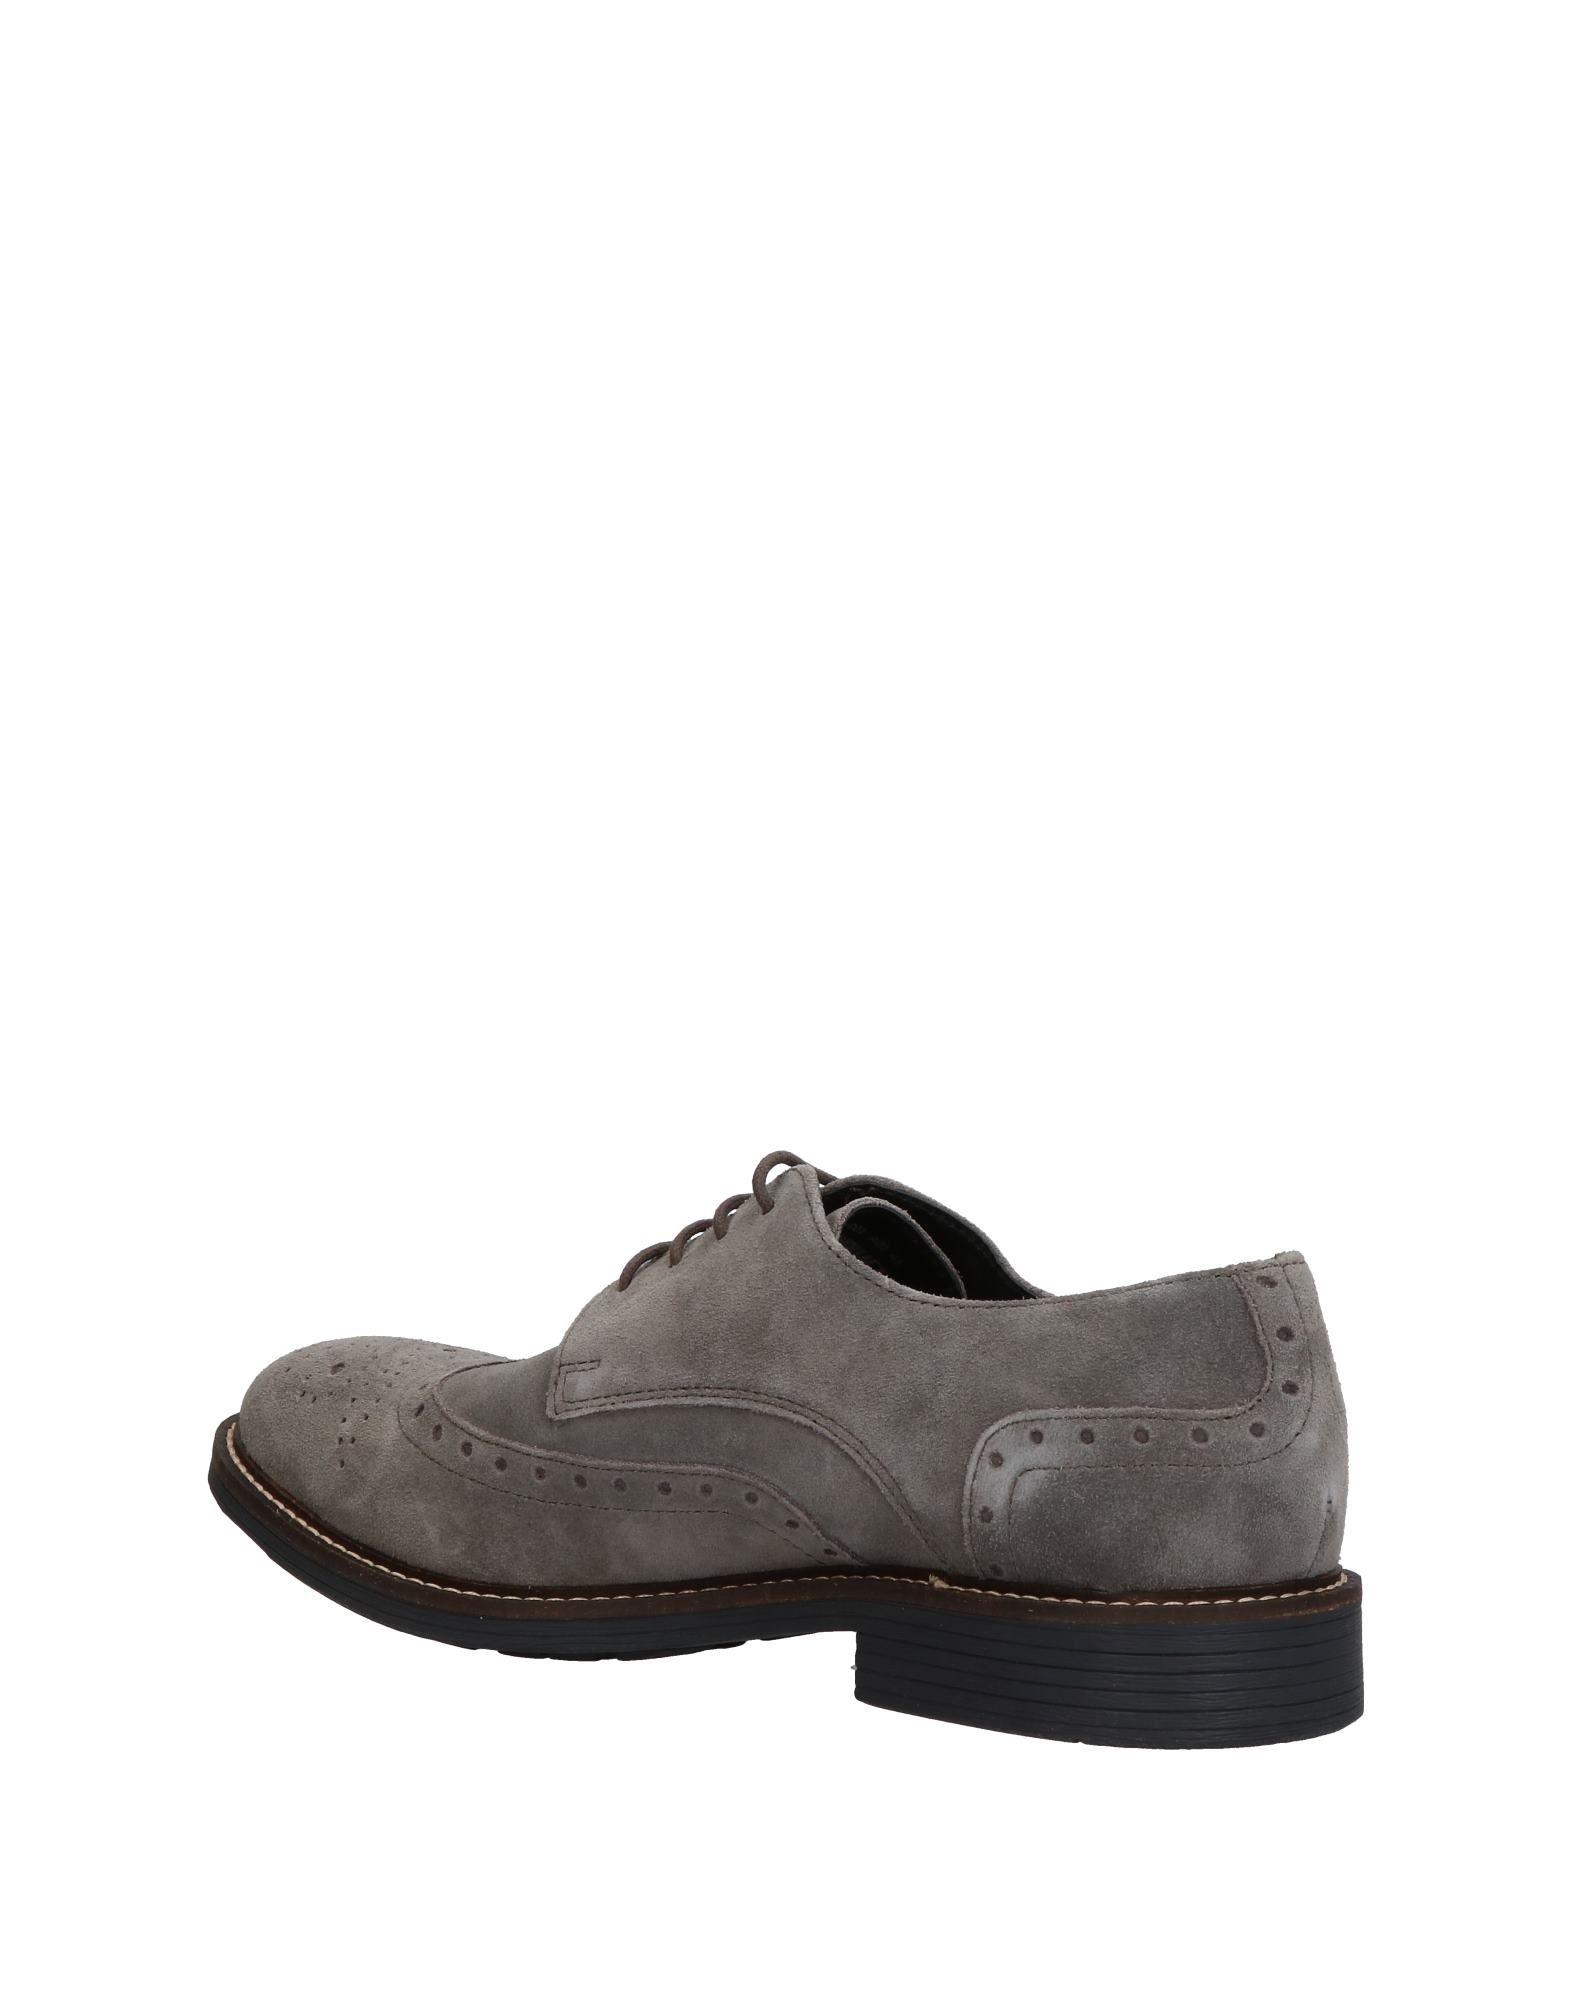 Lumberjack Schnürschuhe Herren Heiße  11337352RW Heiße Herren Schuhe 54f520